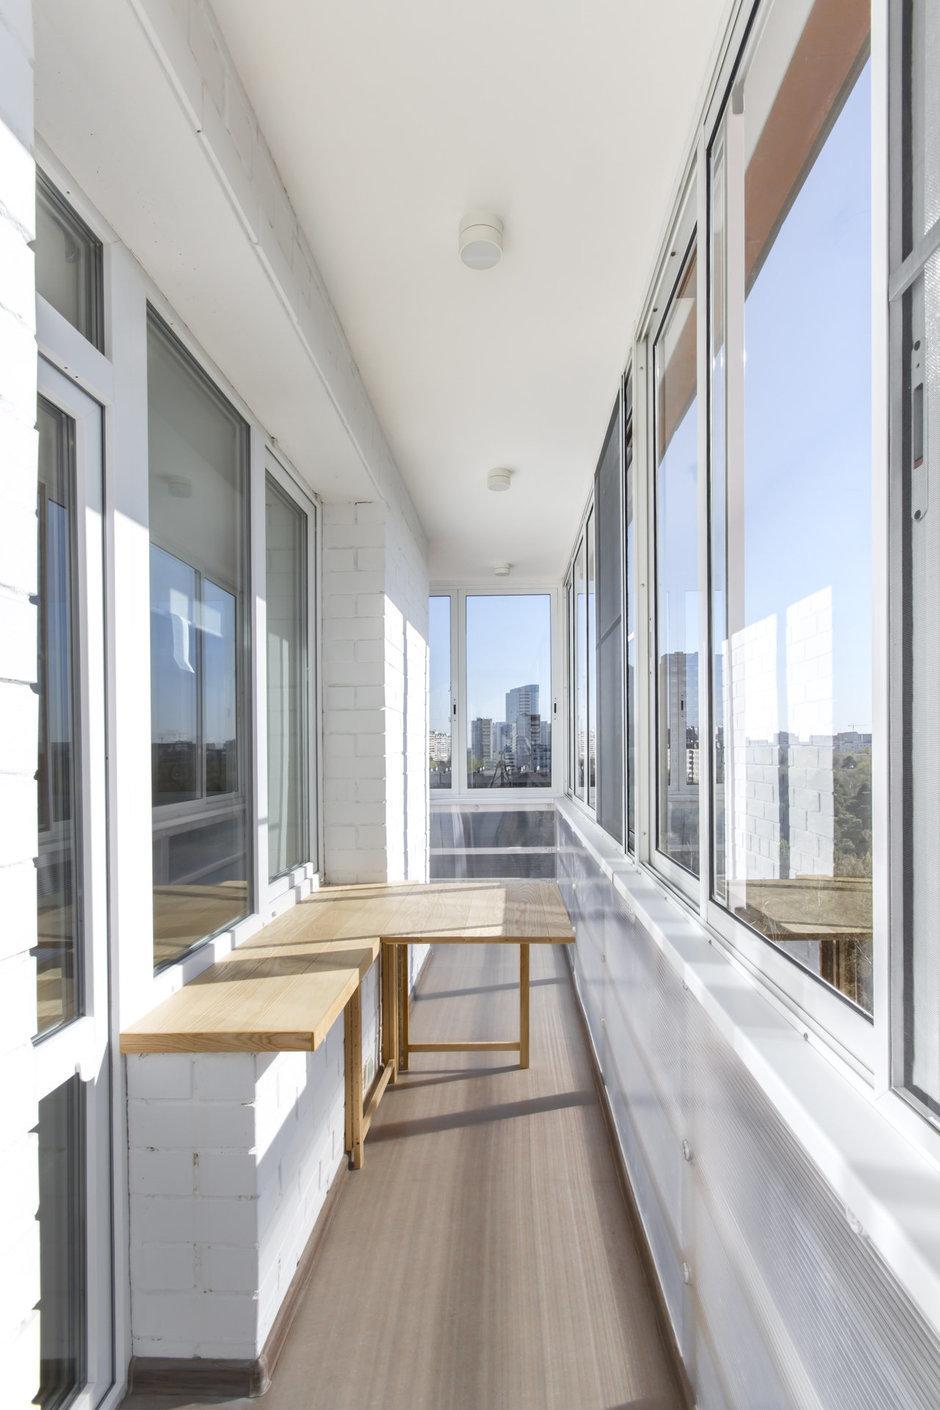 Фотография: Балкон, Терраса в стиле Лофт, Квартира, BoConcept, Дома и квартиры, Белый, IKEA, Проект недели, Мансарда – фото на InMyRoom.ru